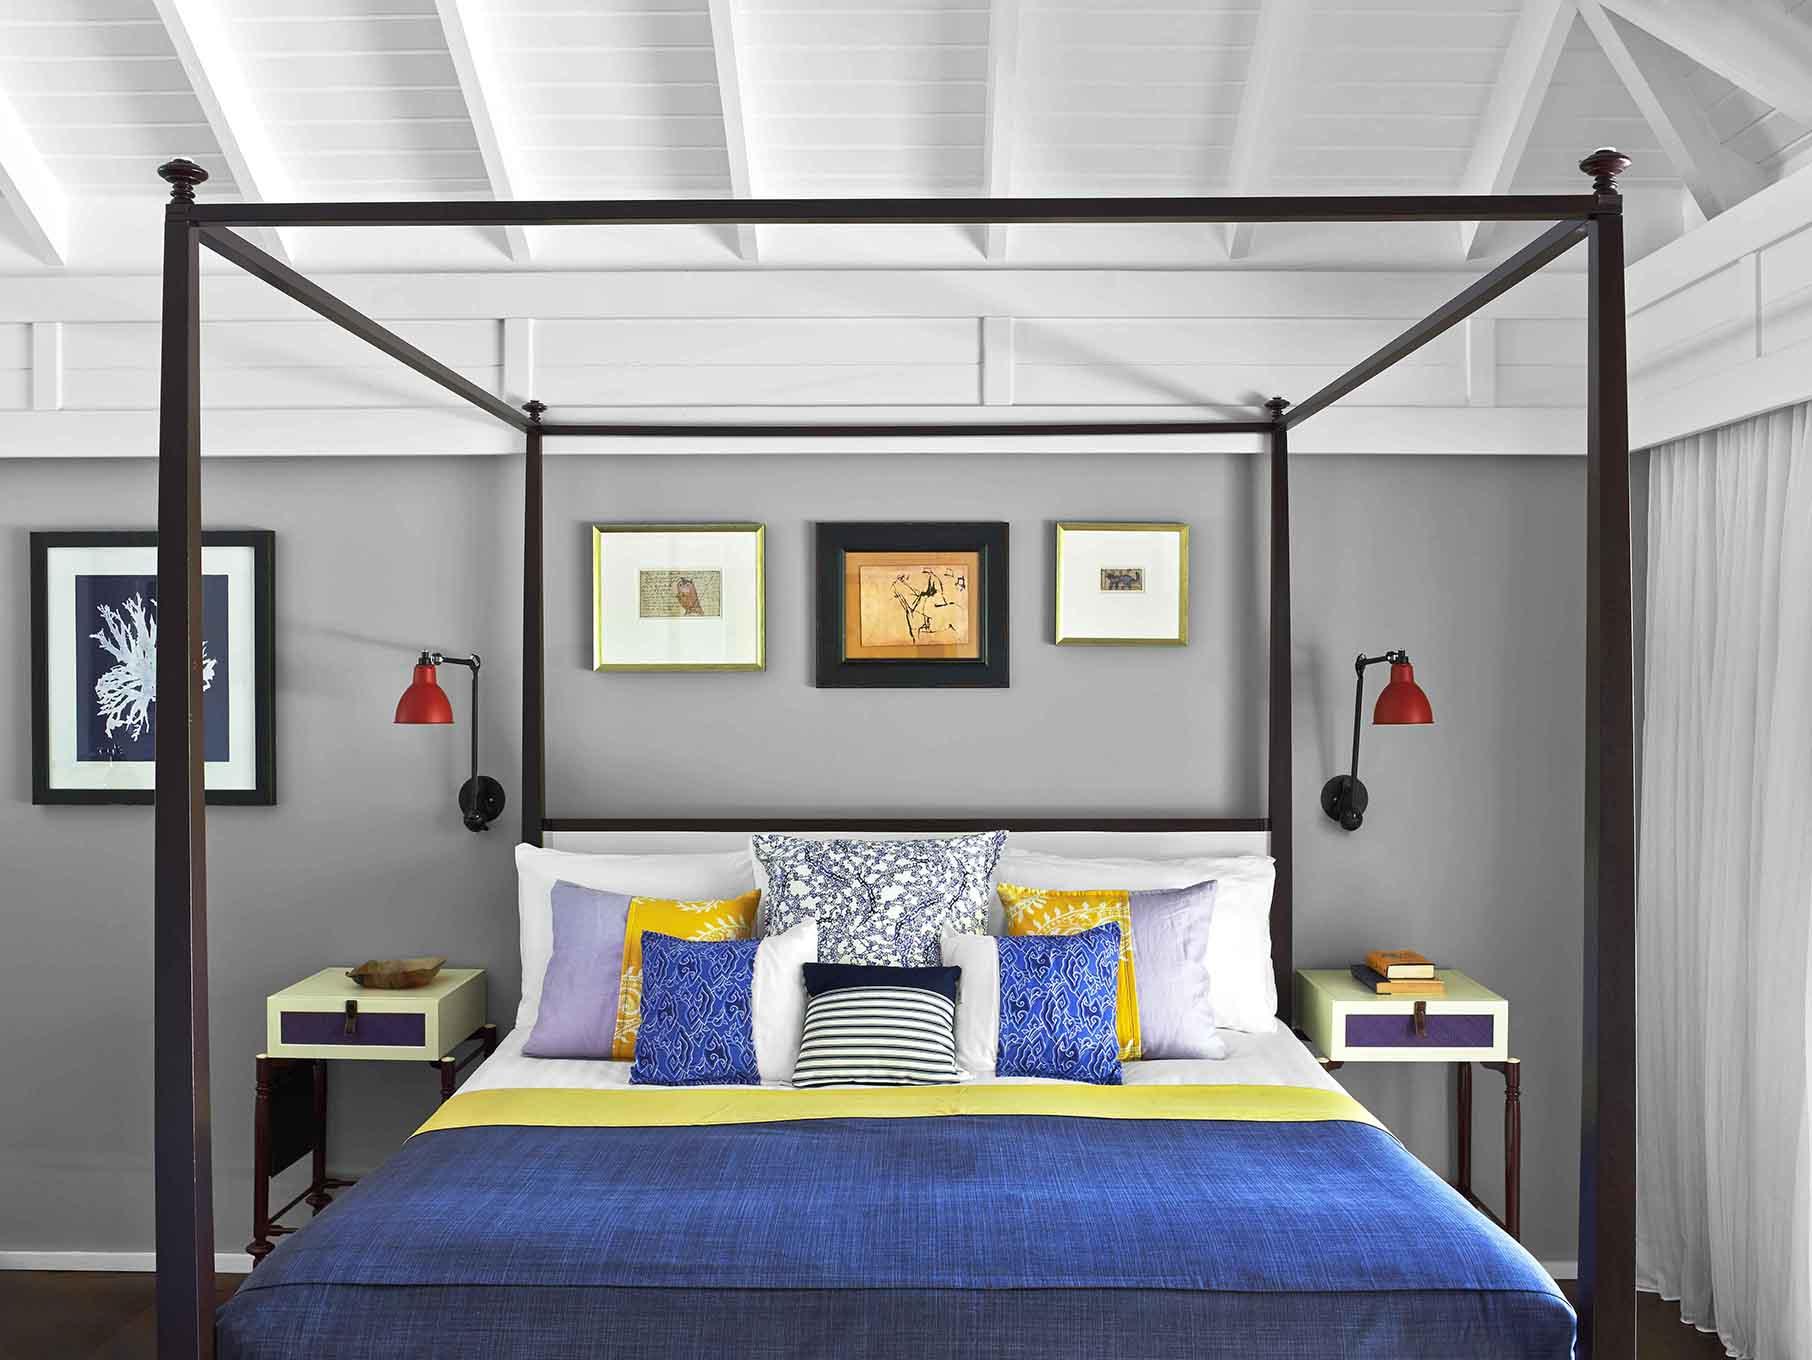 luis-pons-design-interior-tropical-hotel-stbarths_9.jpg